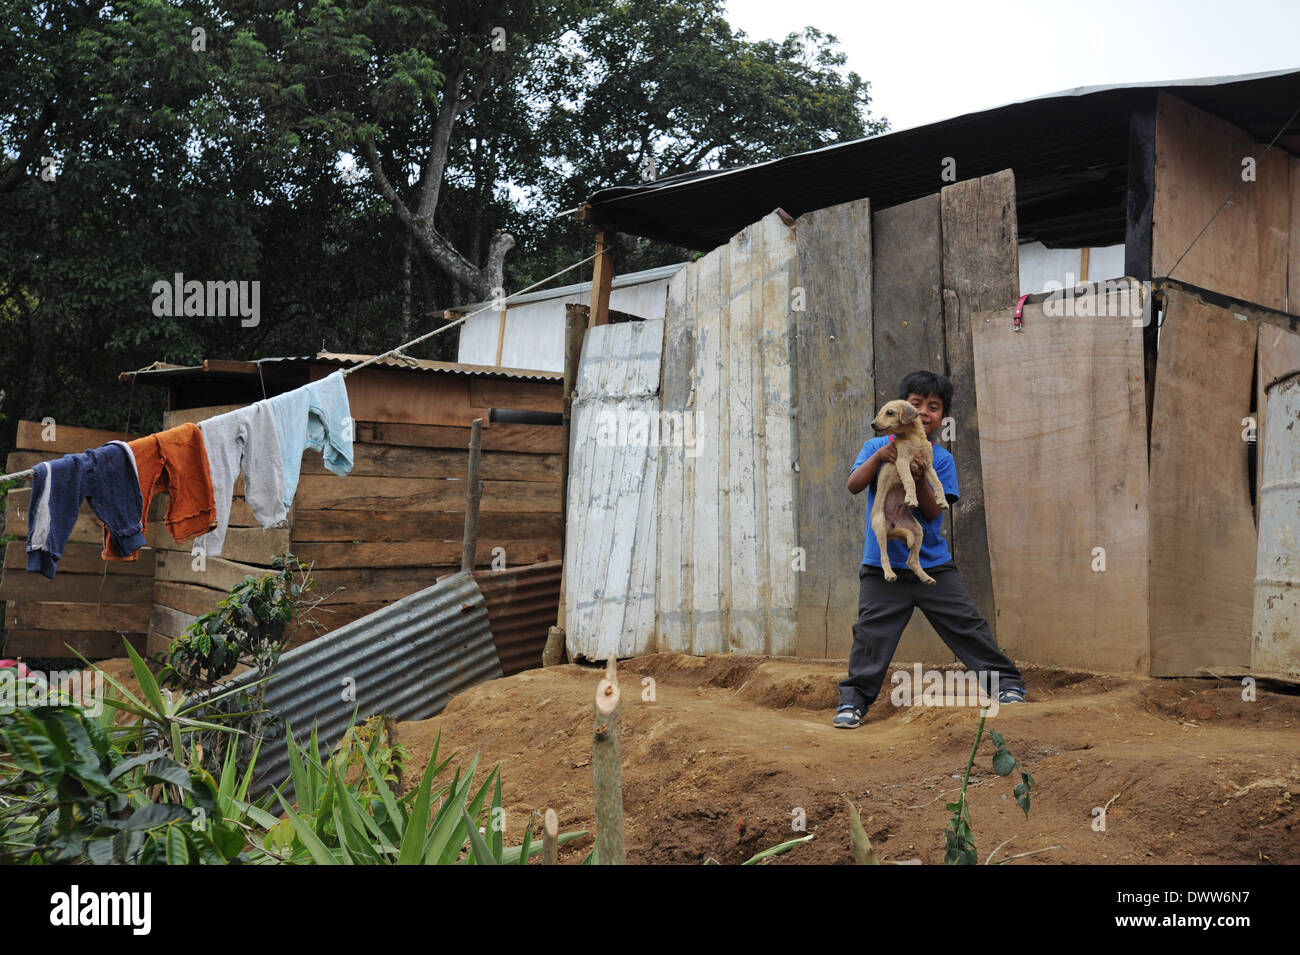 Maya indigenous boy in Aqua Escondida, Solola, Guatemala. - Stock Image